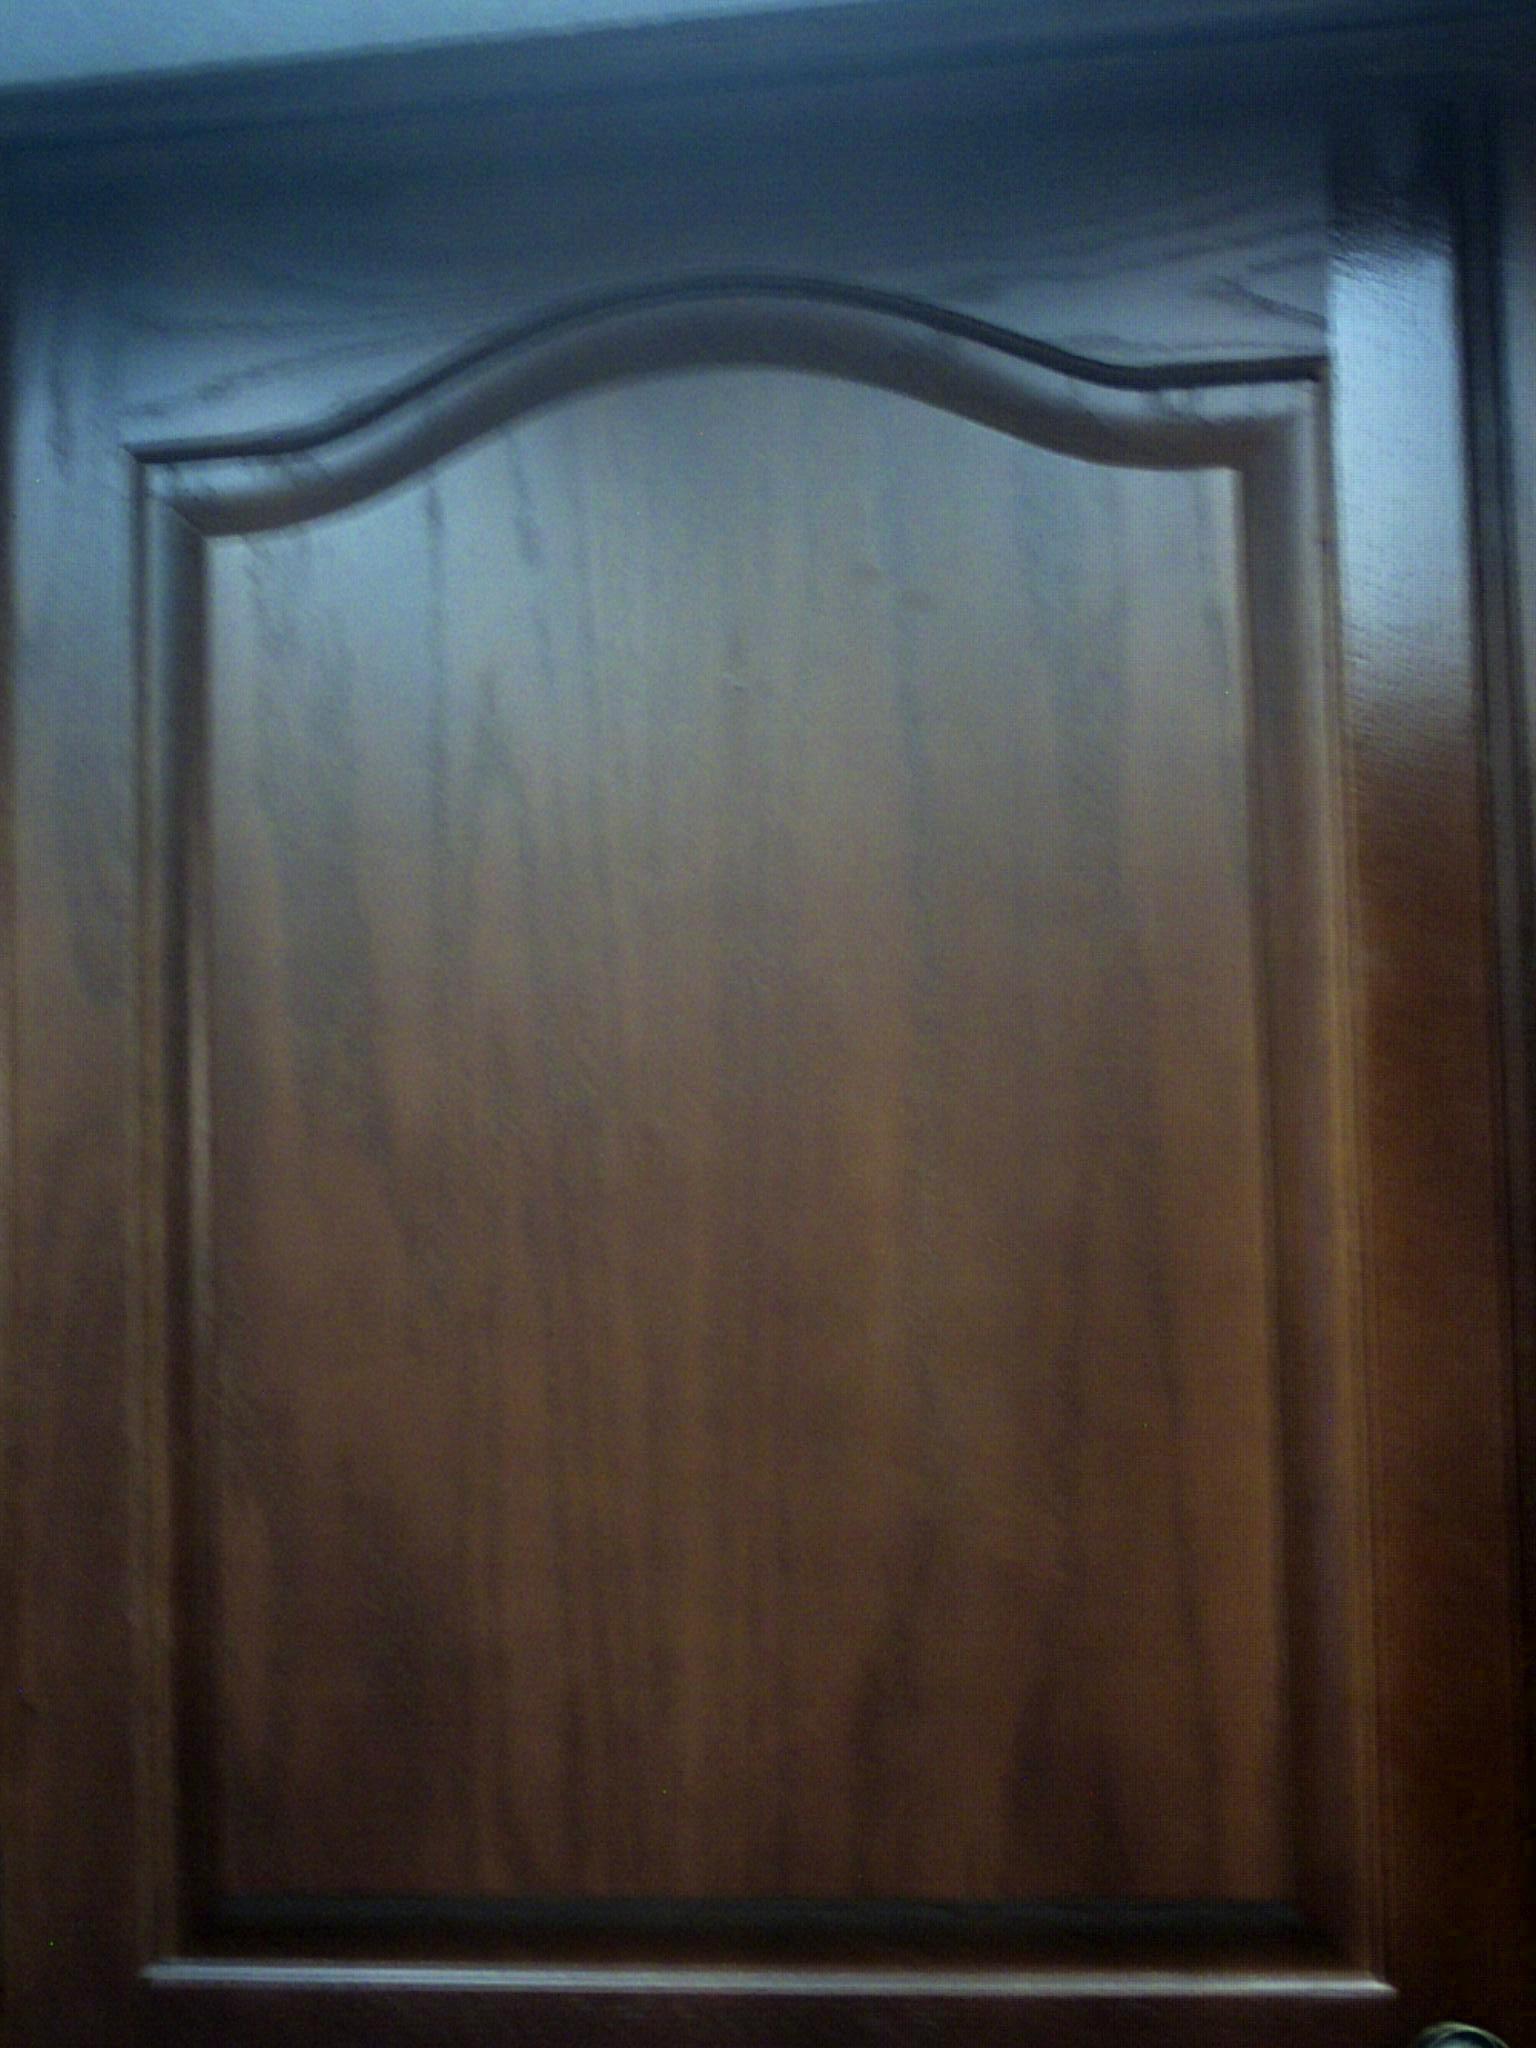 dark cabinet refinishing oak kitchen cabinet doors Upper Corner cherry wood kitchen cupboard cabinets refinished Closeup of refinished cherrywood kitchen cupboard door